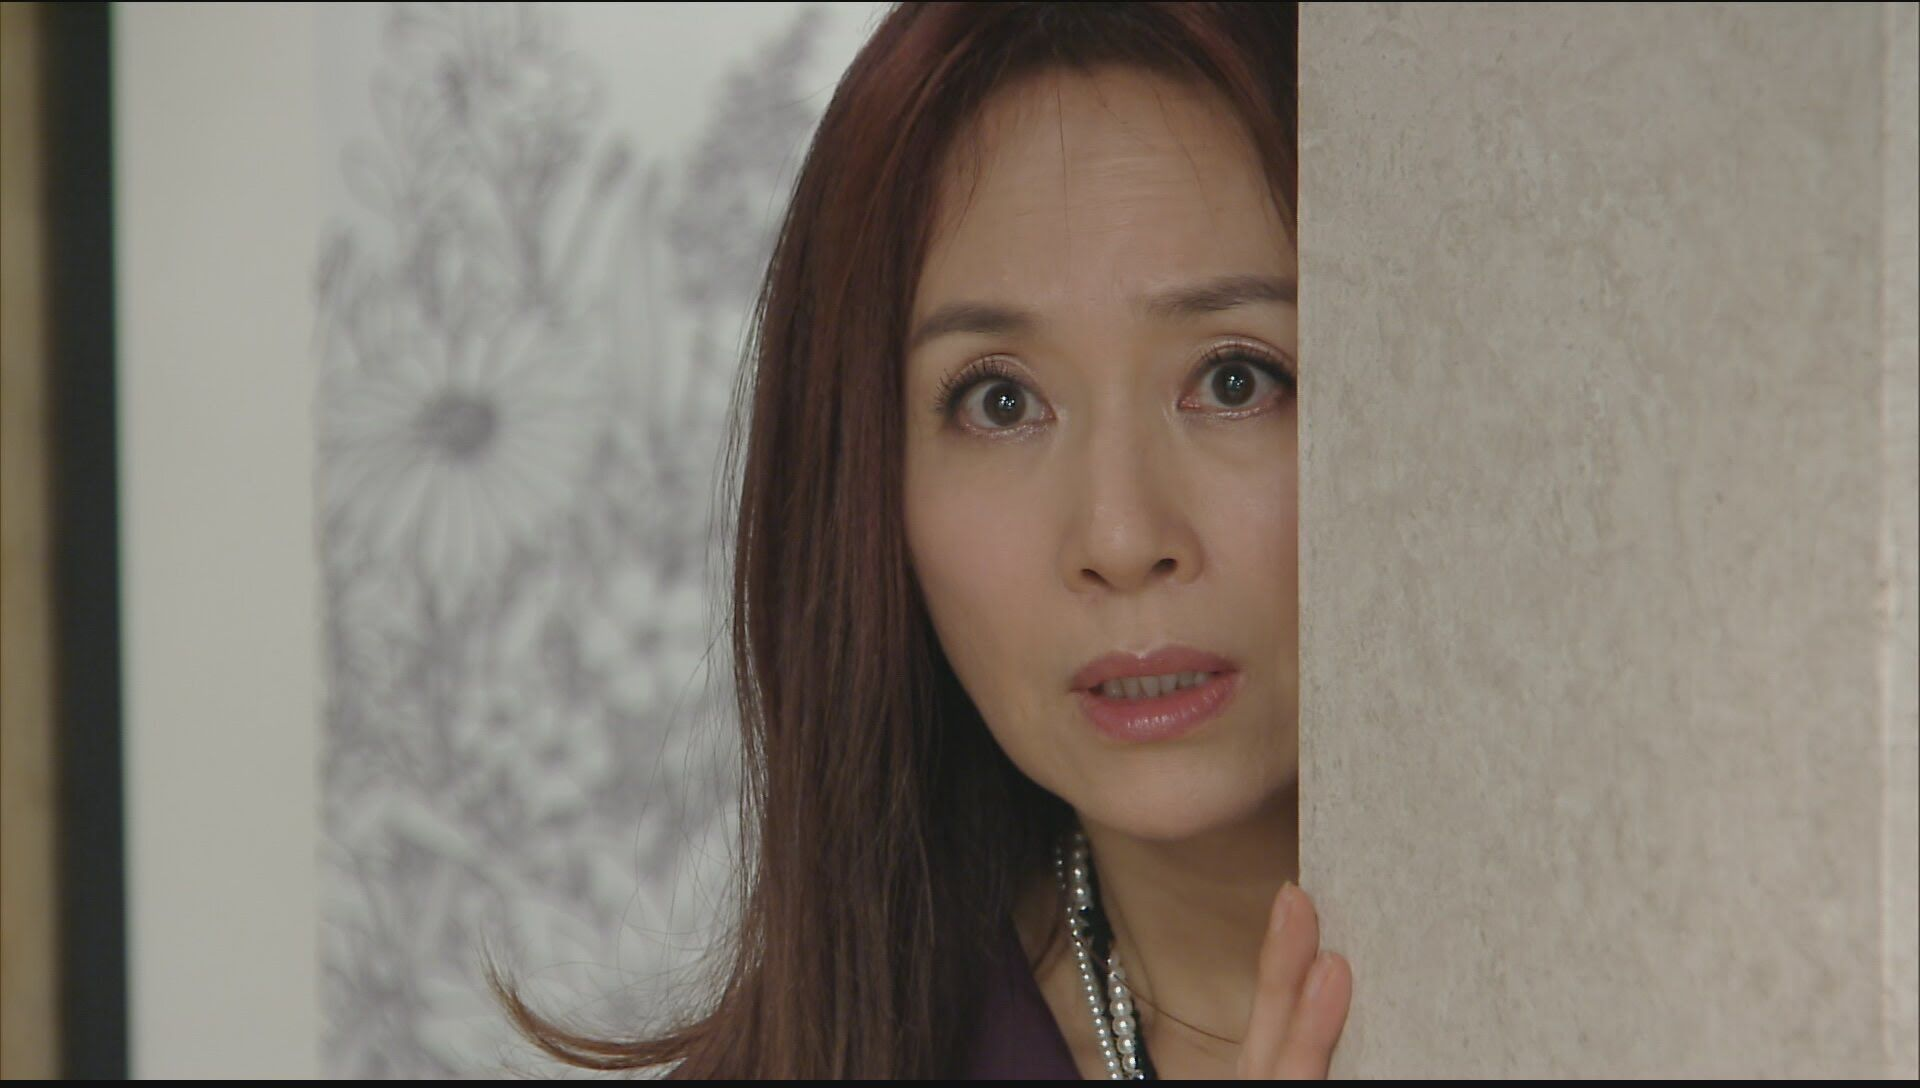 [A Daughter Just Like You] 딱 너같은 딸 102회 - Hae-mi,ompulsory hospitalizati...